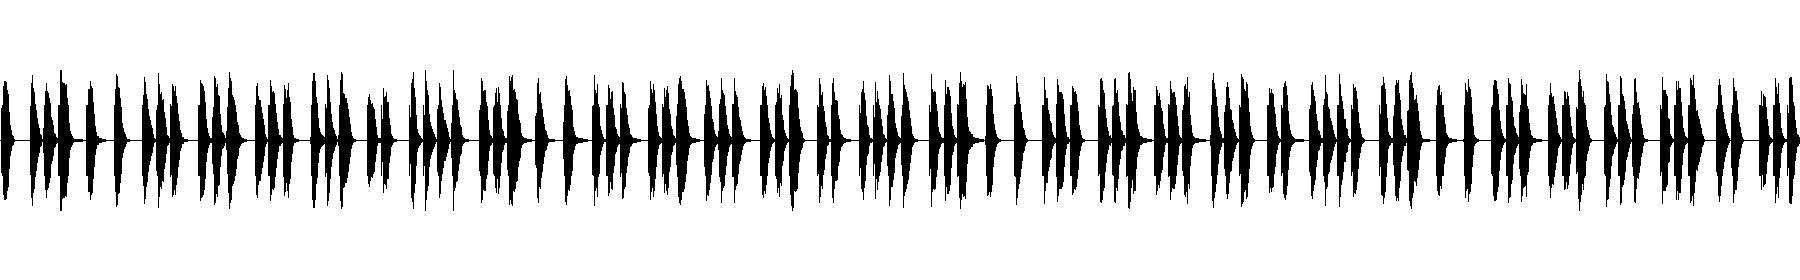 sh 1015